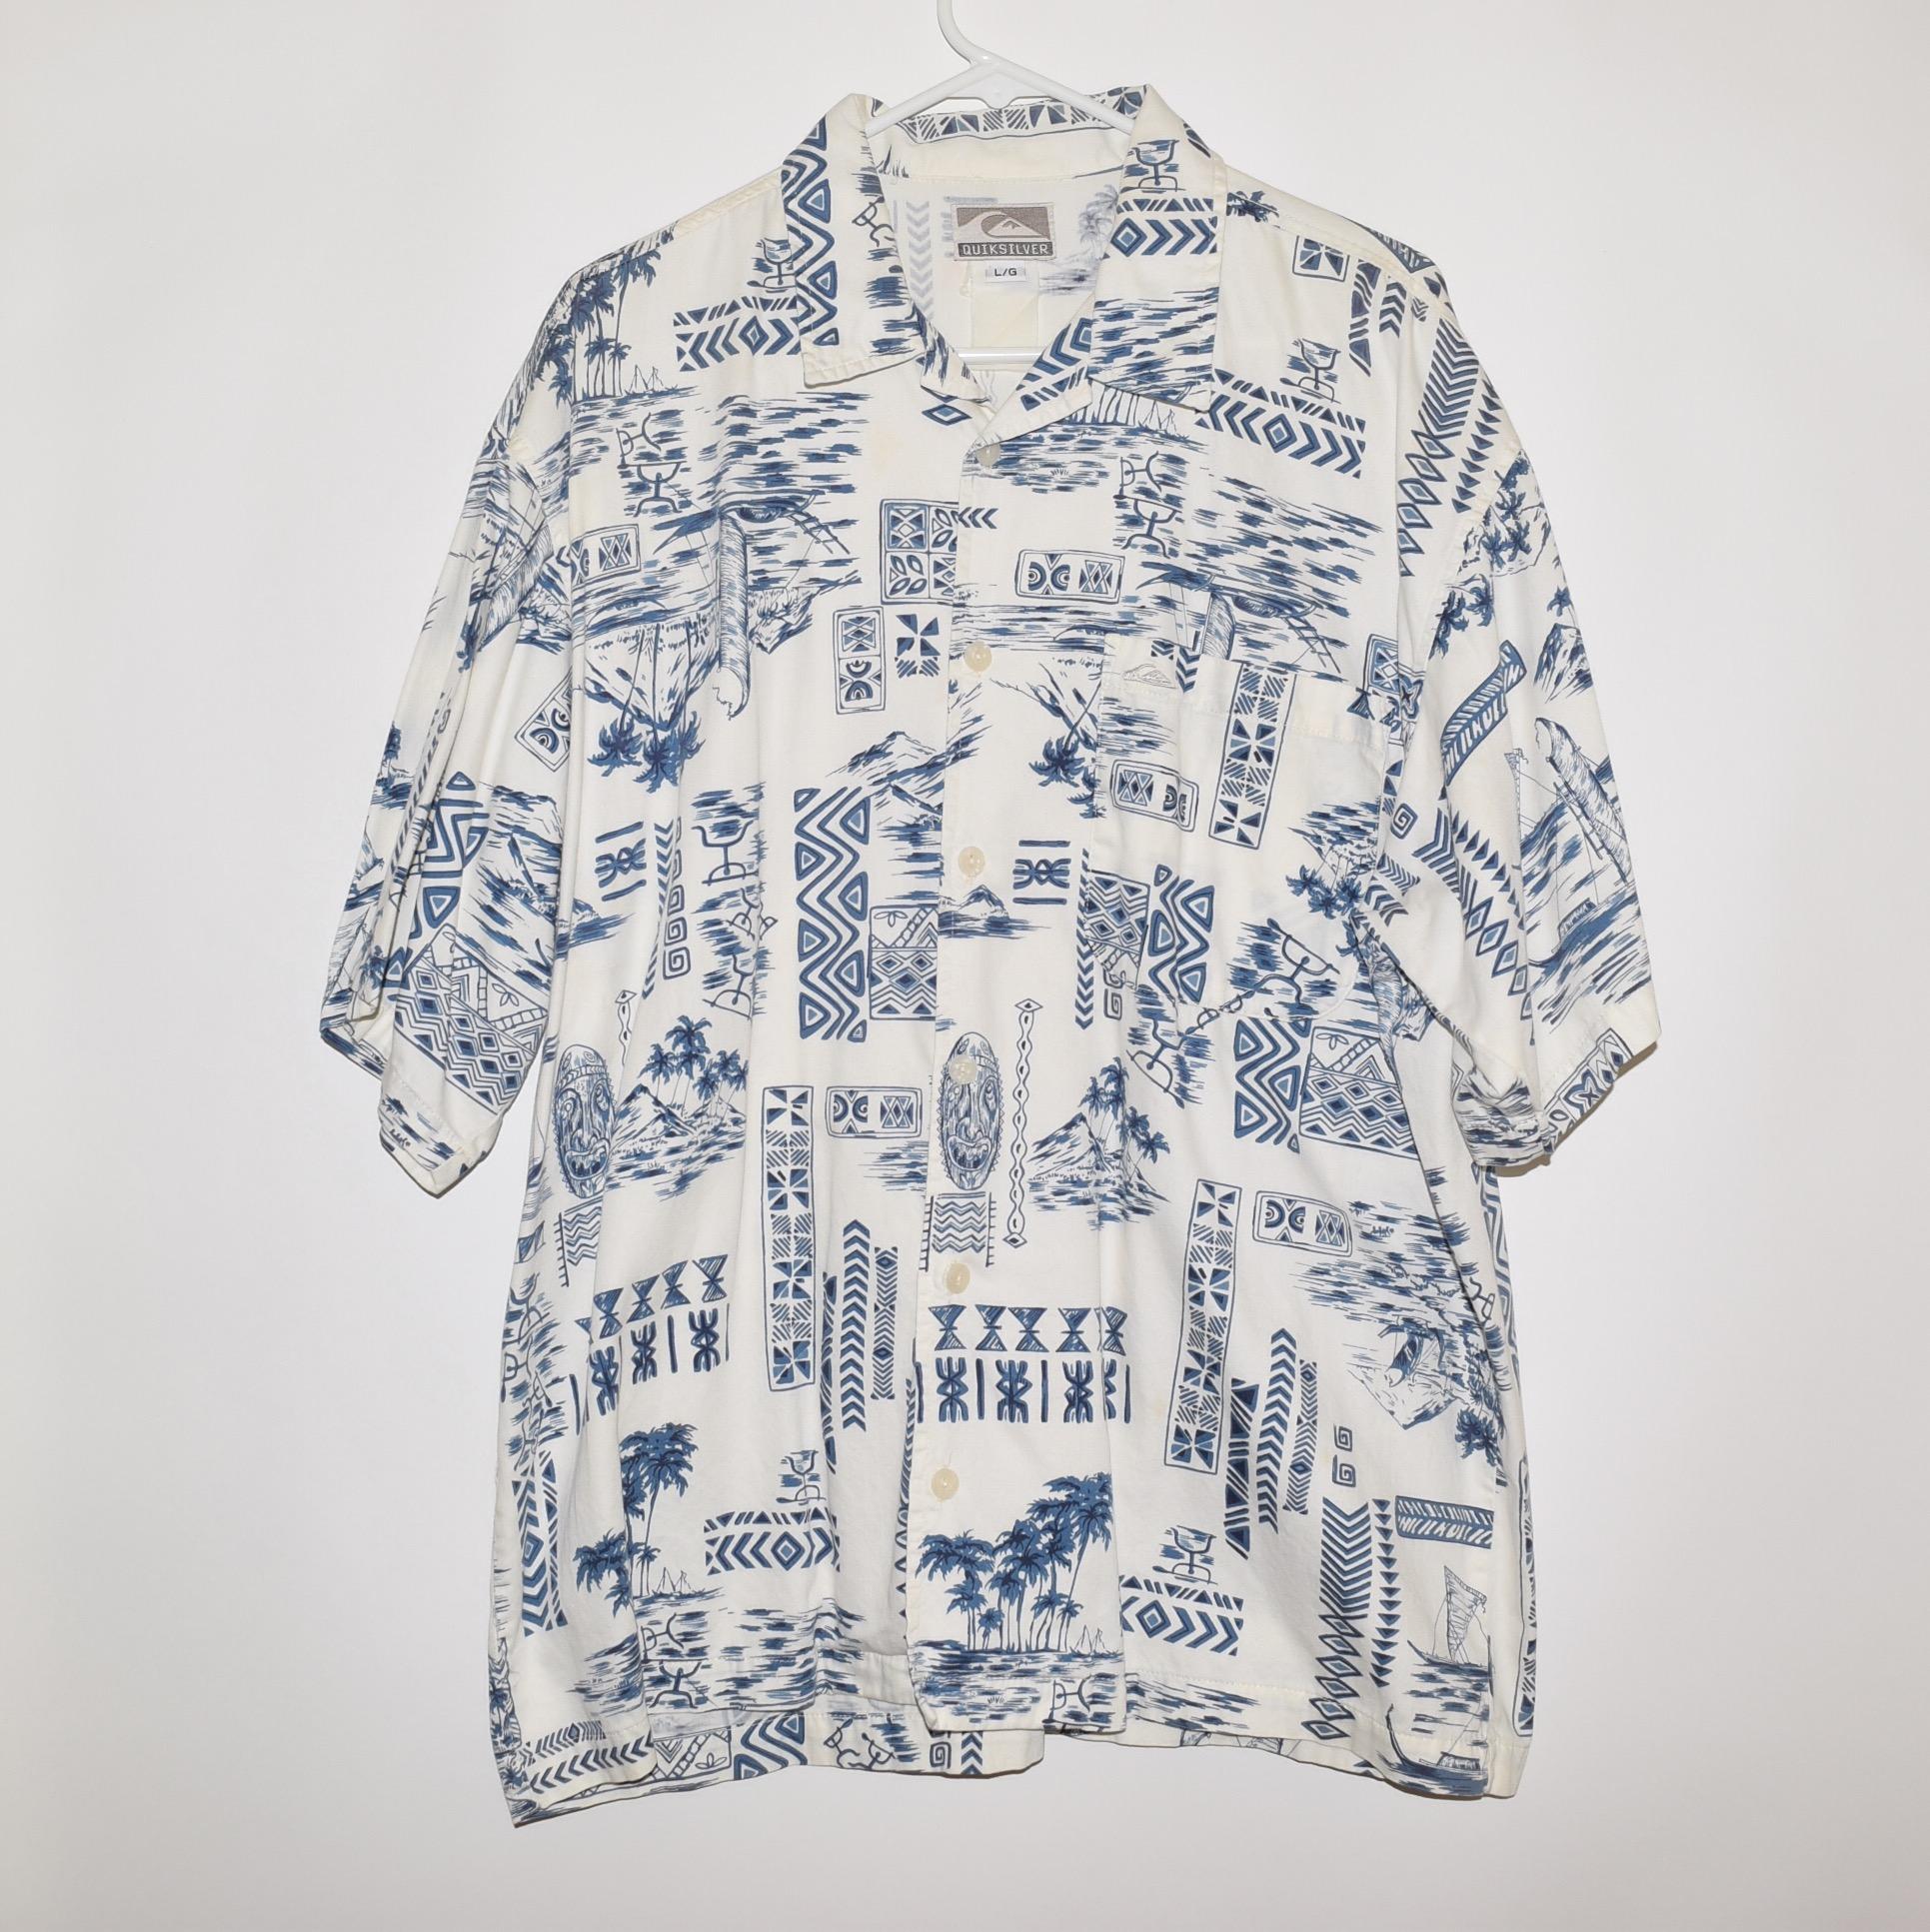 ff7909b9 Vintage × Quiksilver ×. Rare 90's VTG Vintage Quiksilver Men's Hawaiian  Short Sleeve Casual Shirt Large